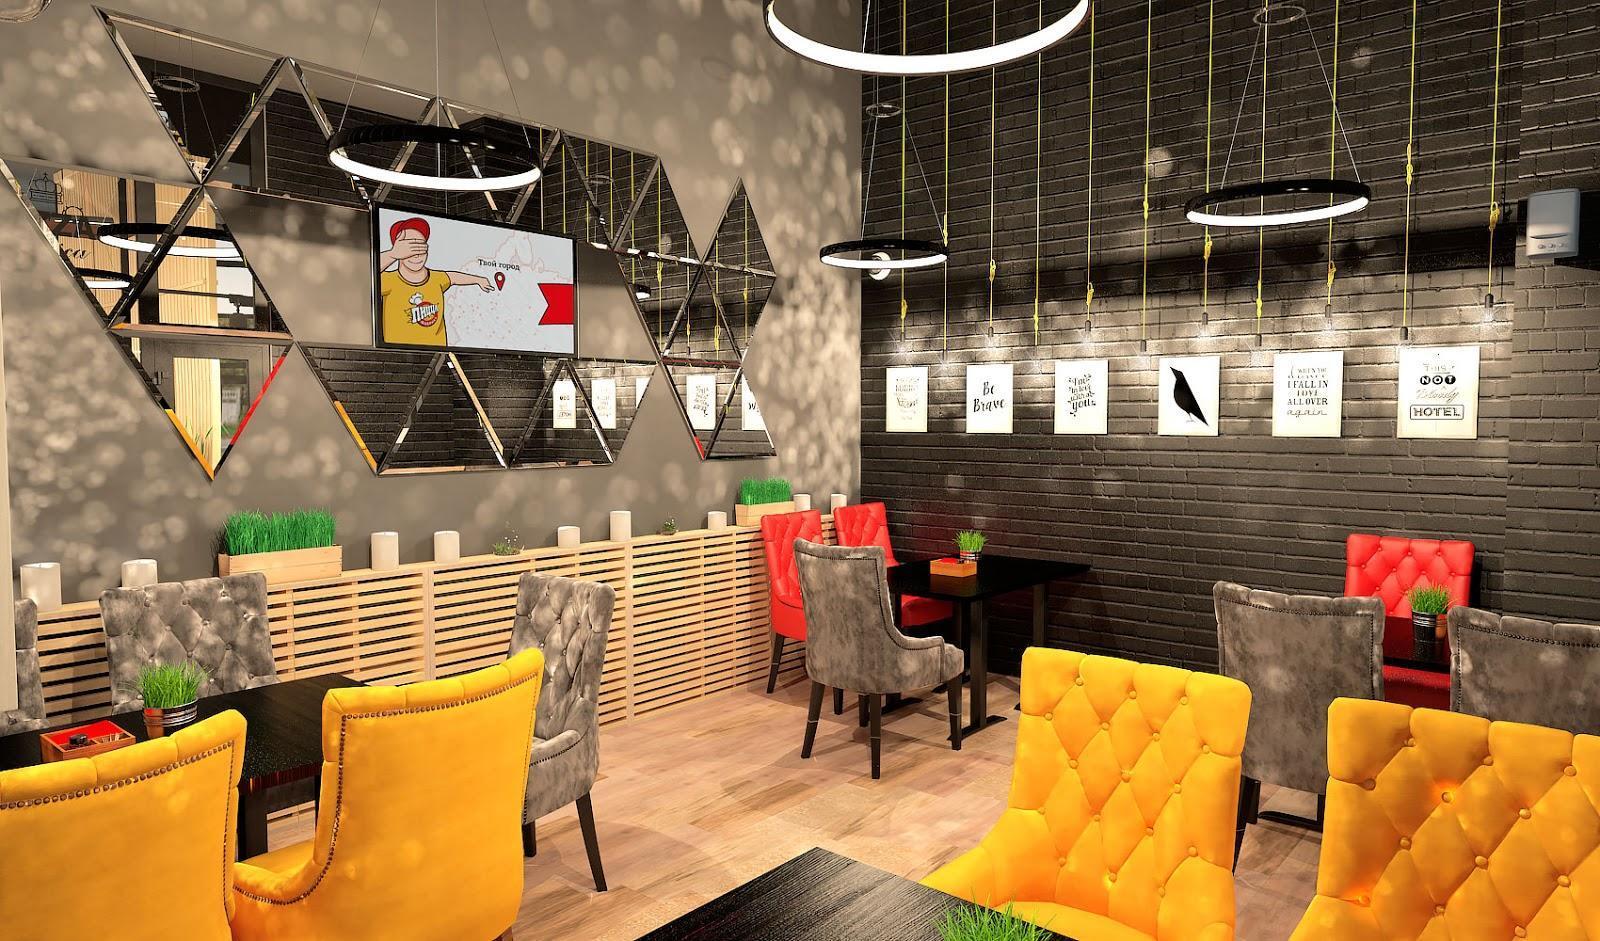 ПиццаФабрика Тольятти 3Д визуализация